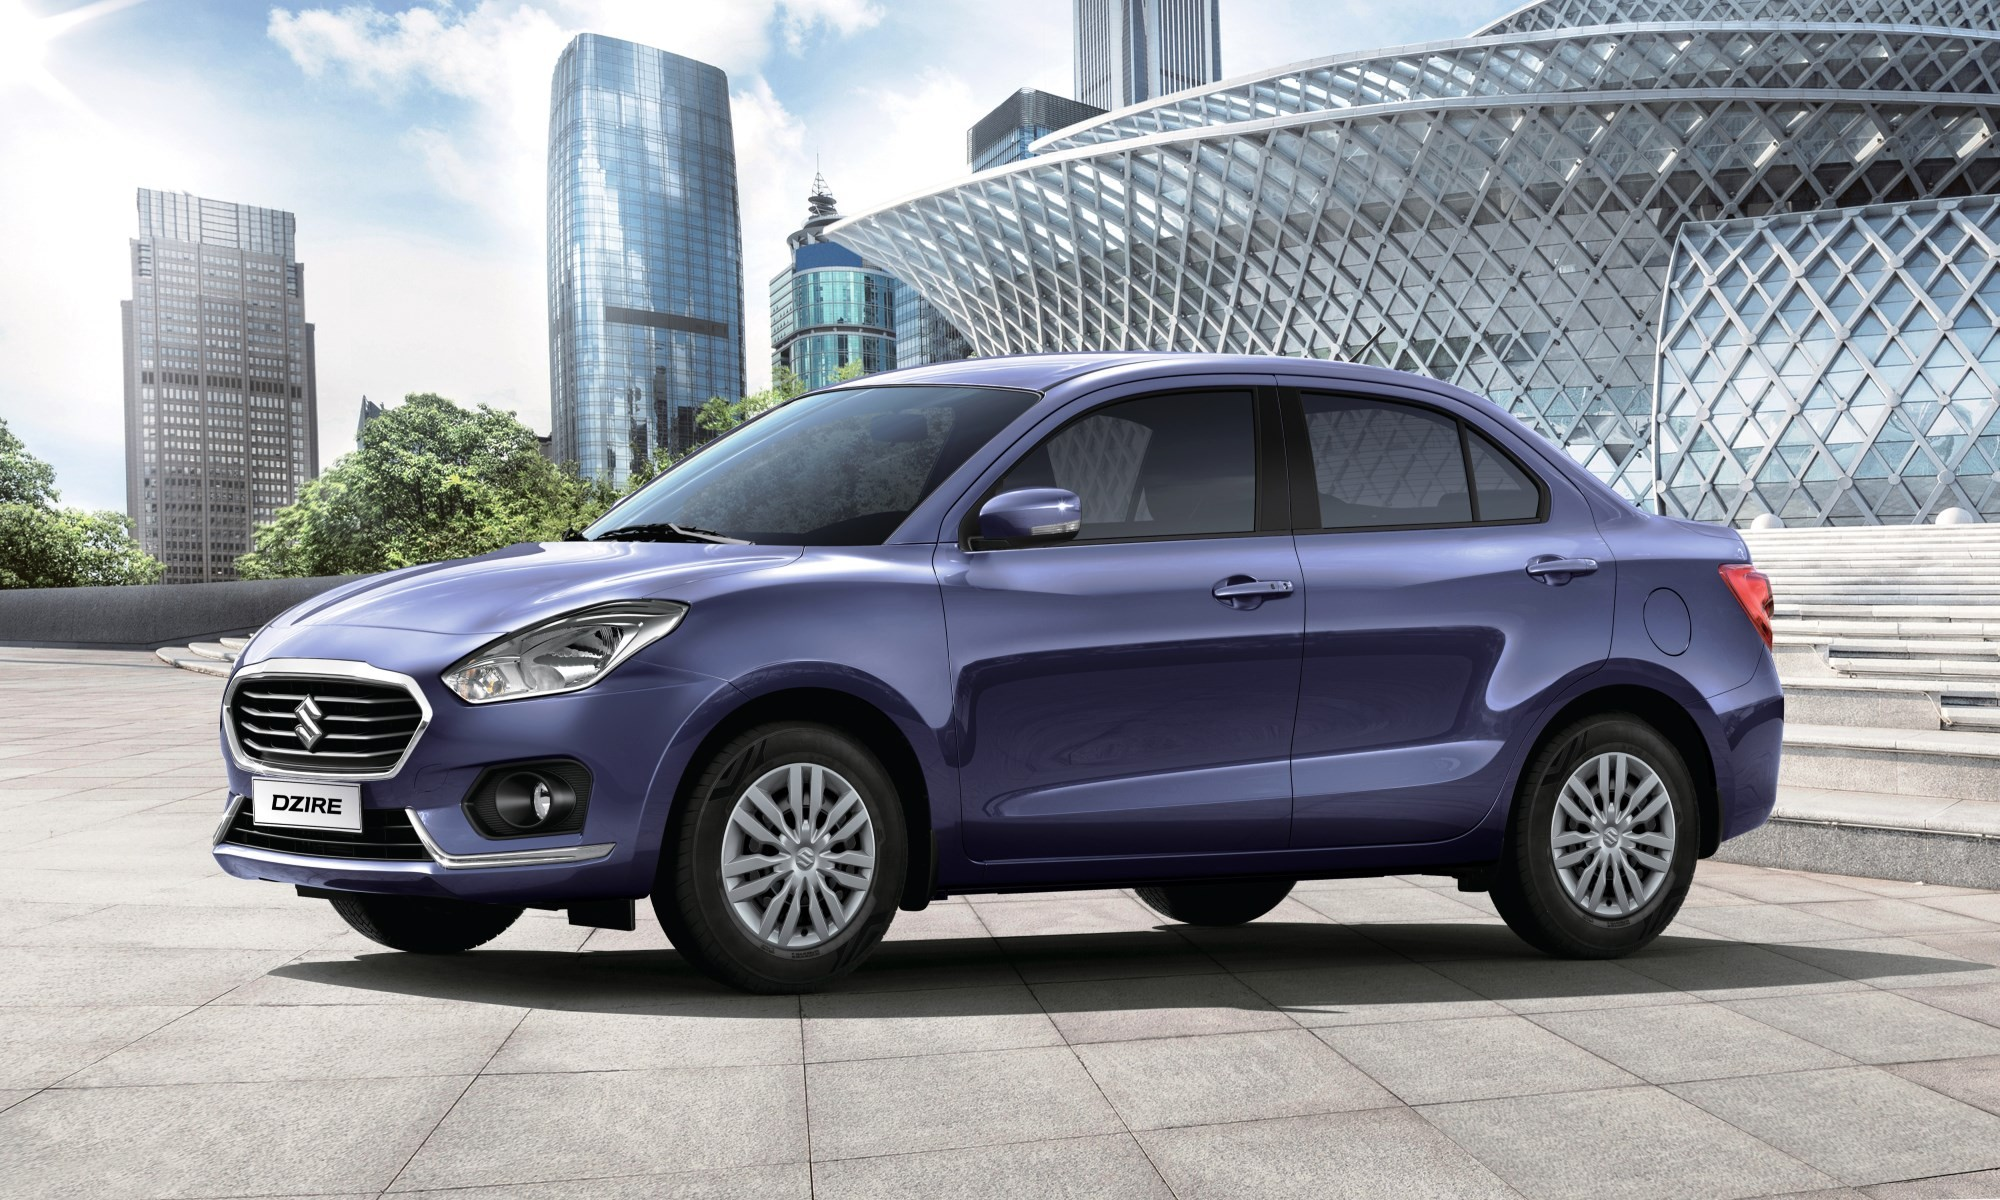 Suzuki Dzire driven